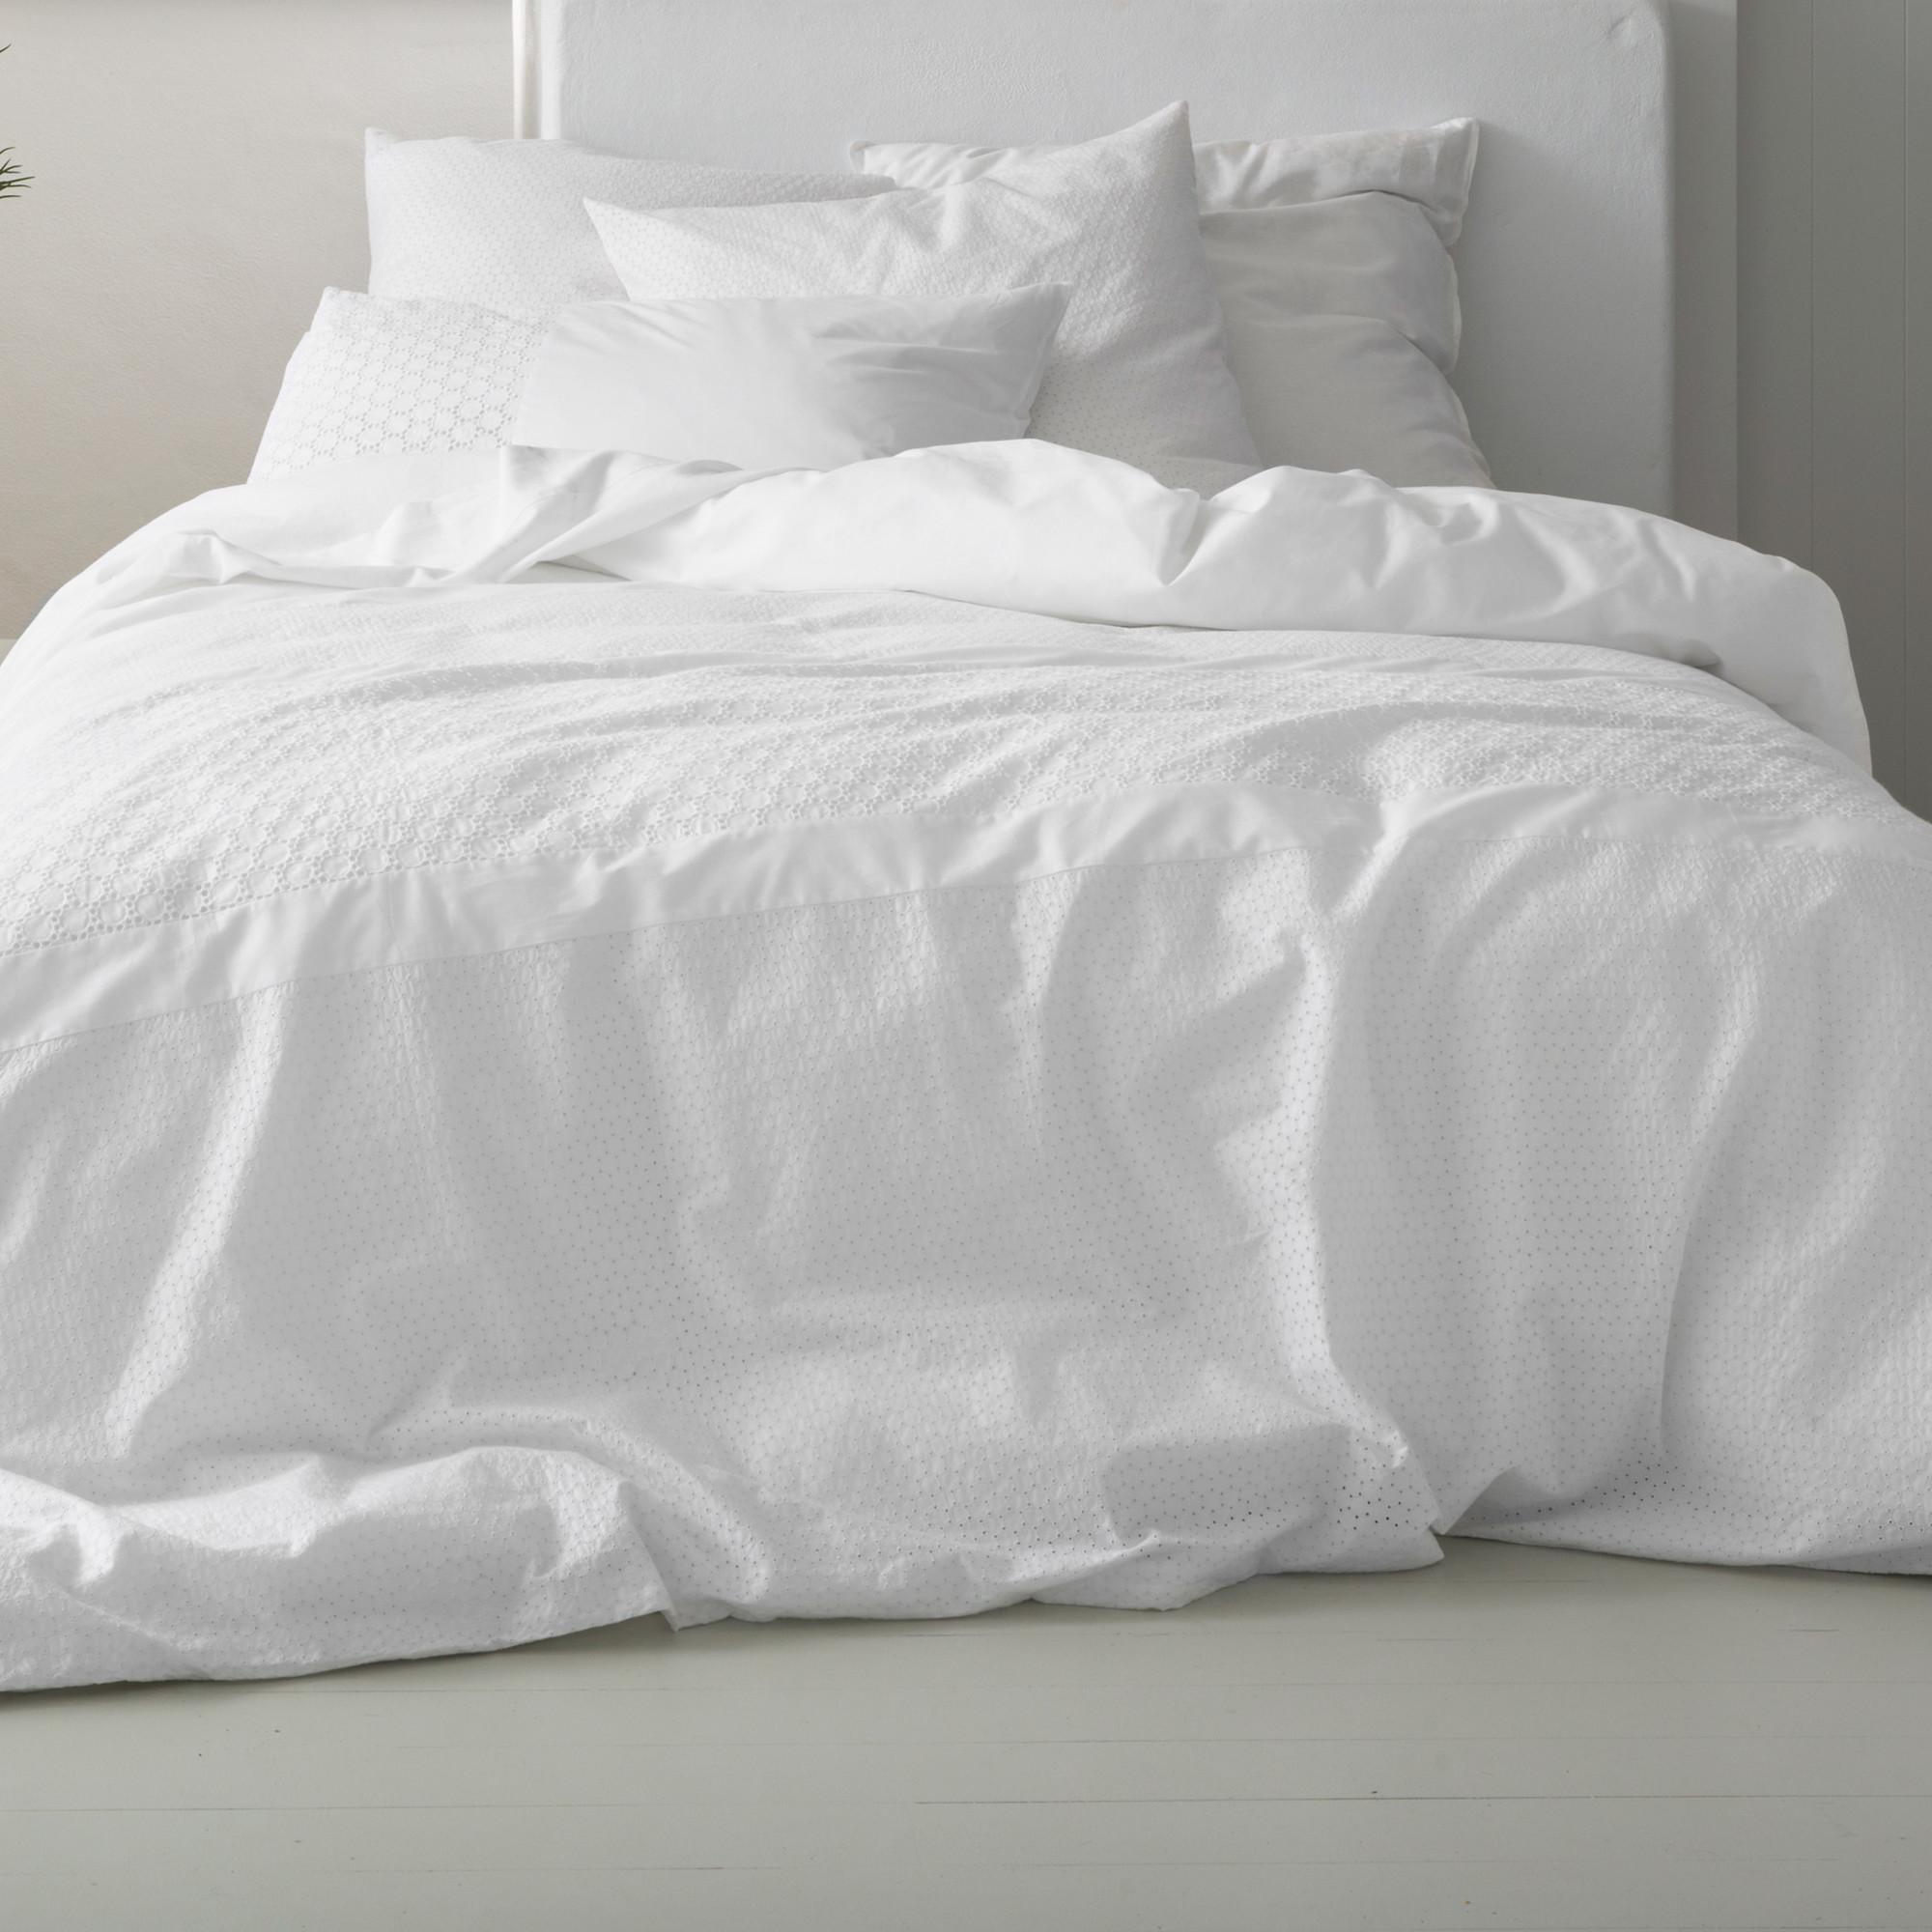 product organic in cover white duvet